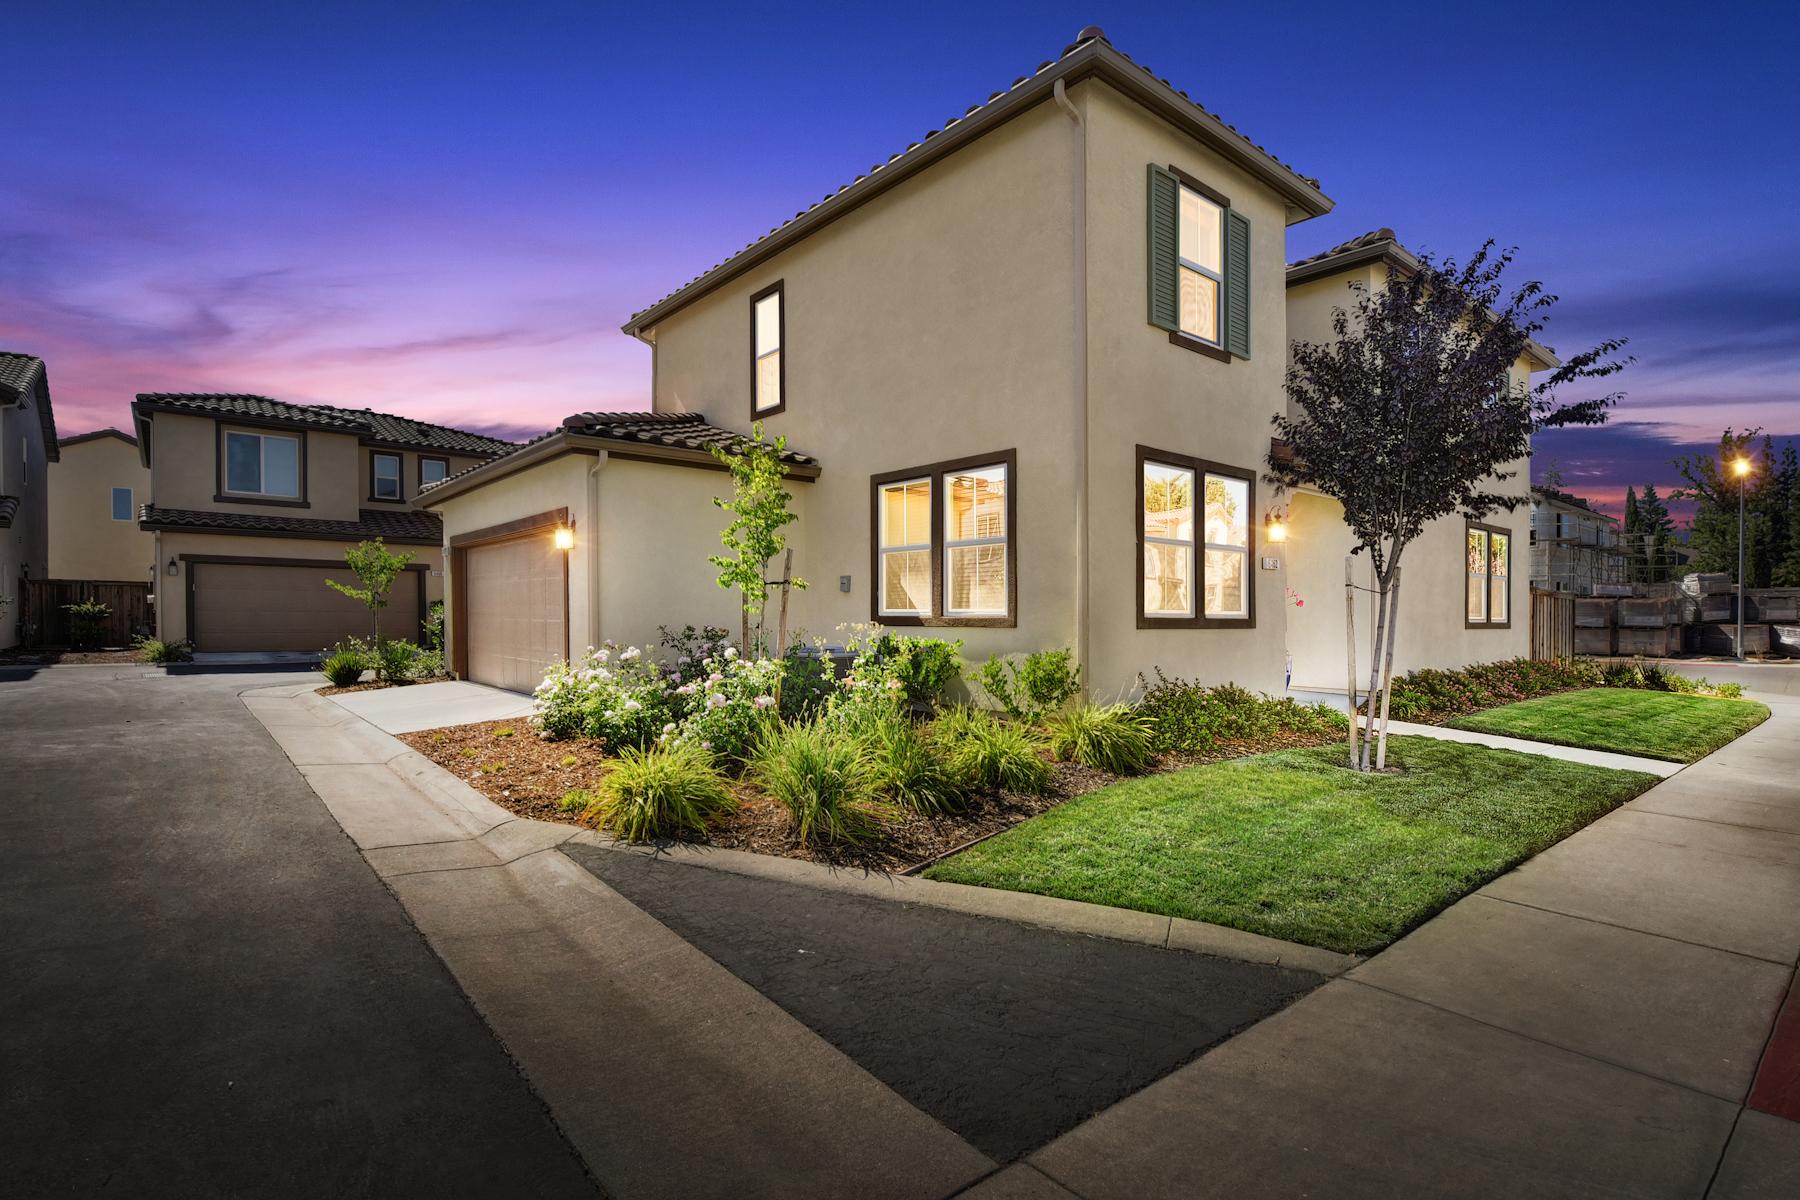 Property For Sale Fair Oaks